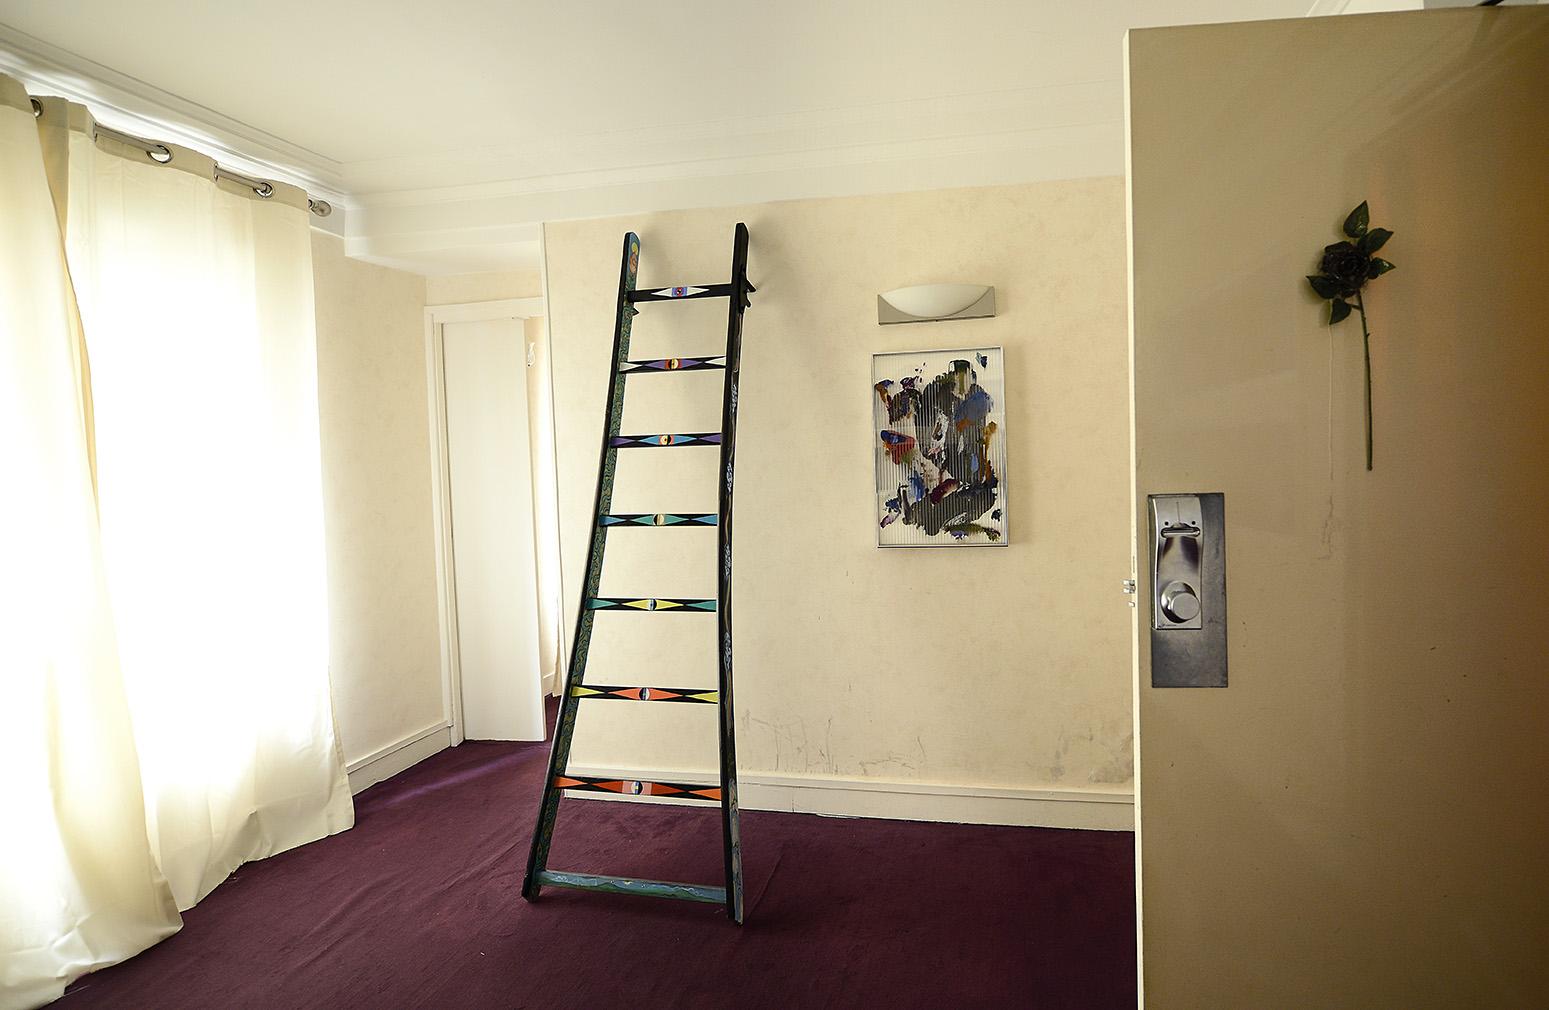 03-chambre-7-gastaldon-kitching_fkp1727web.jpg